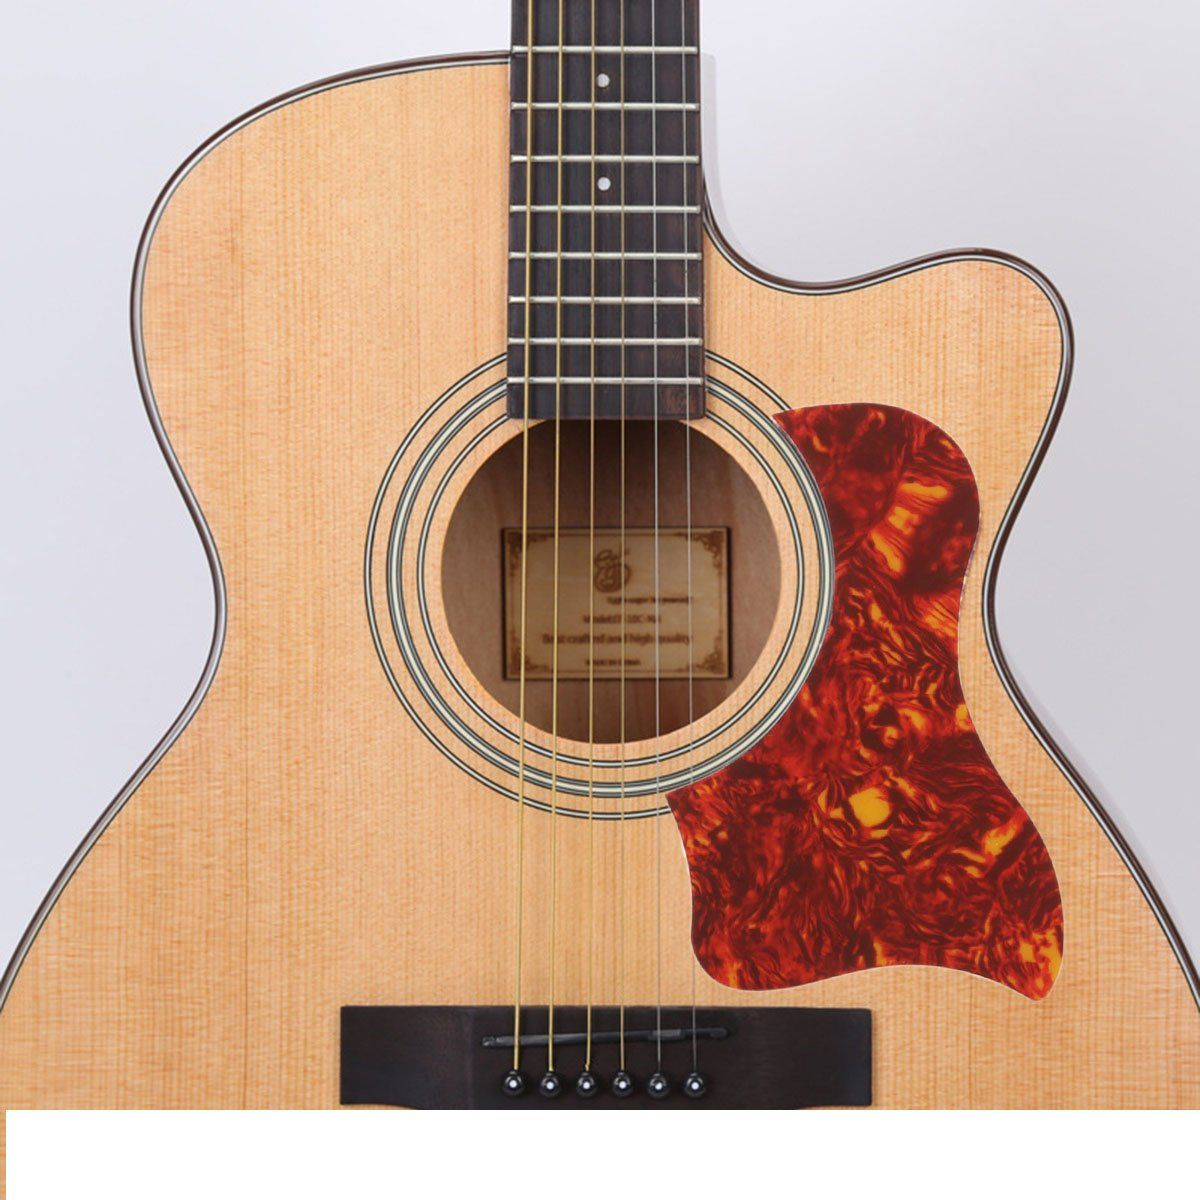 Pakala66 Acoustic Guitar Pickguard Pack Of 5i Hummingbird And Water Shaped Self Adhesive Click Image For More Details It Guitar Pickguard Acoustic Guitar